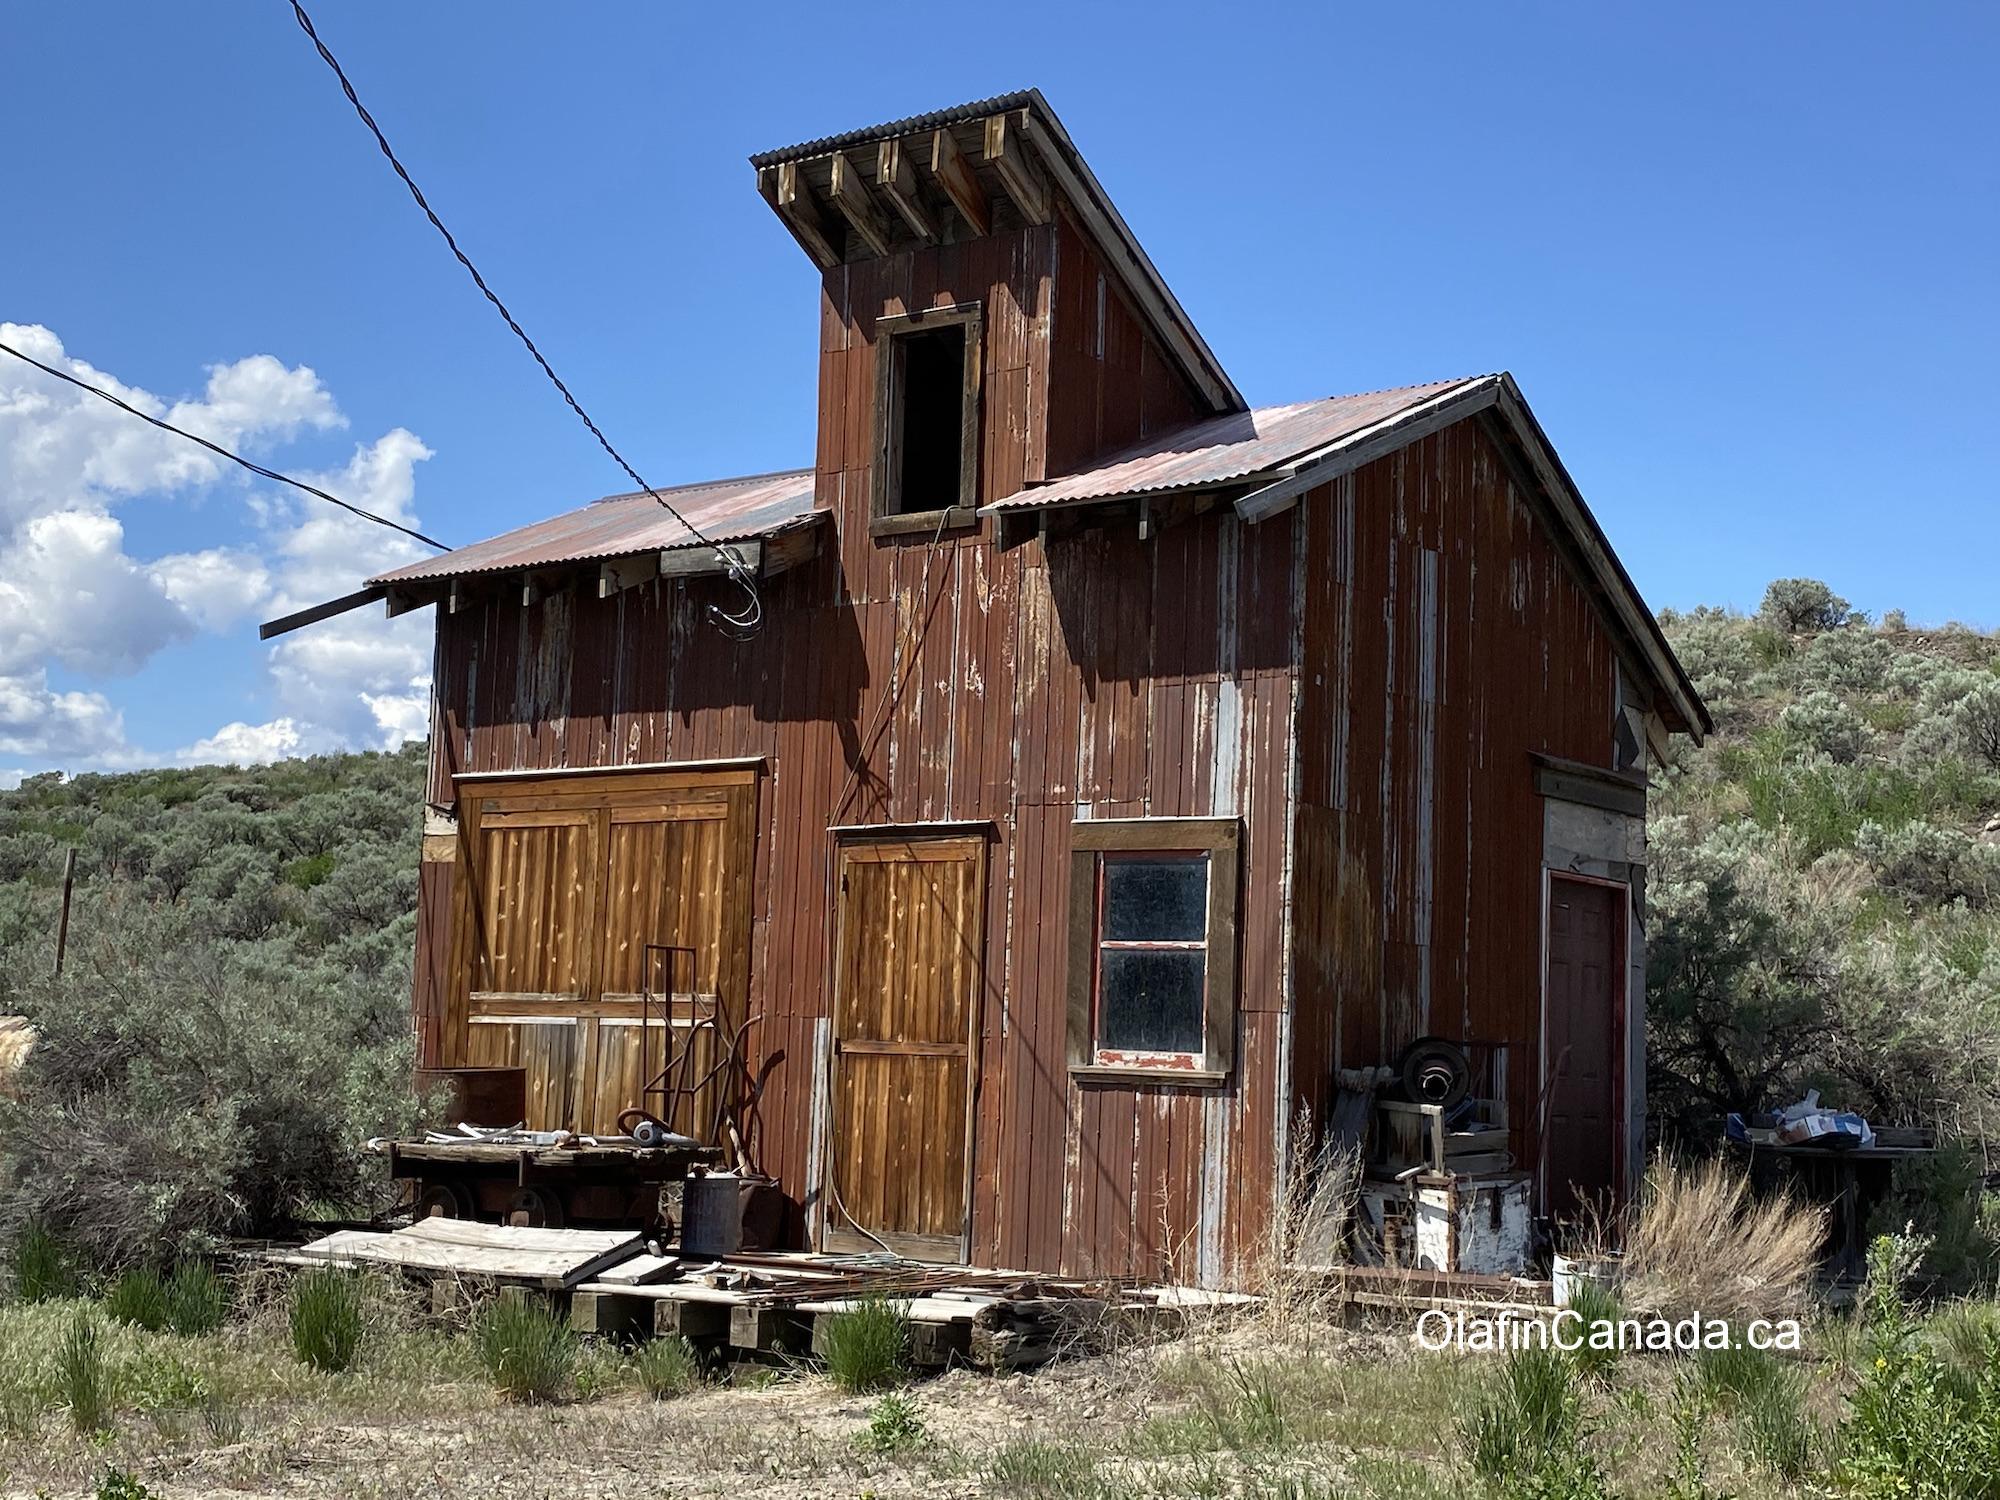 Old house at Deadman Junction Ranch on Hwy 1 between Kamloops and Cache Creek #olafincanada #britishcolumbia #discoverbc #abandonedbc #kamloops